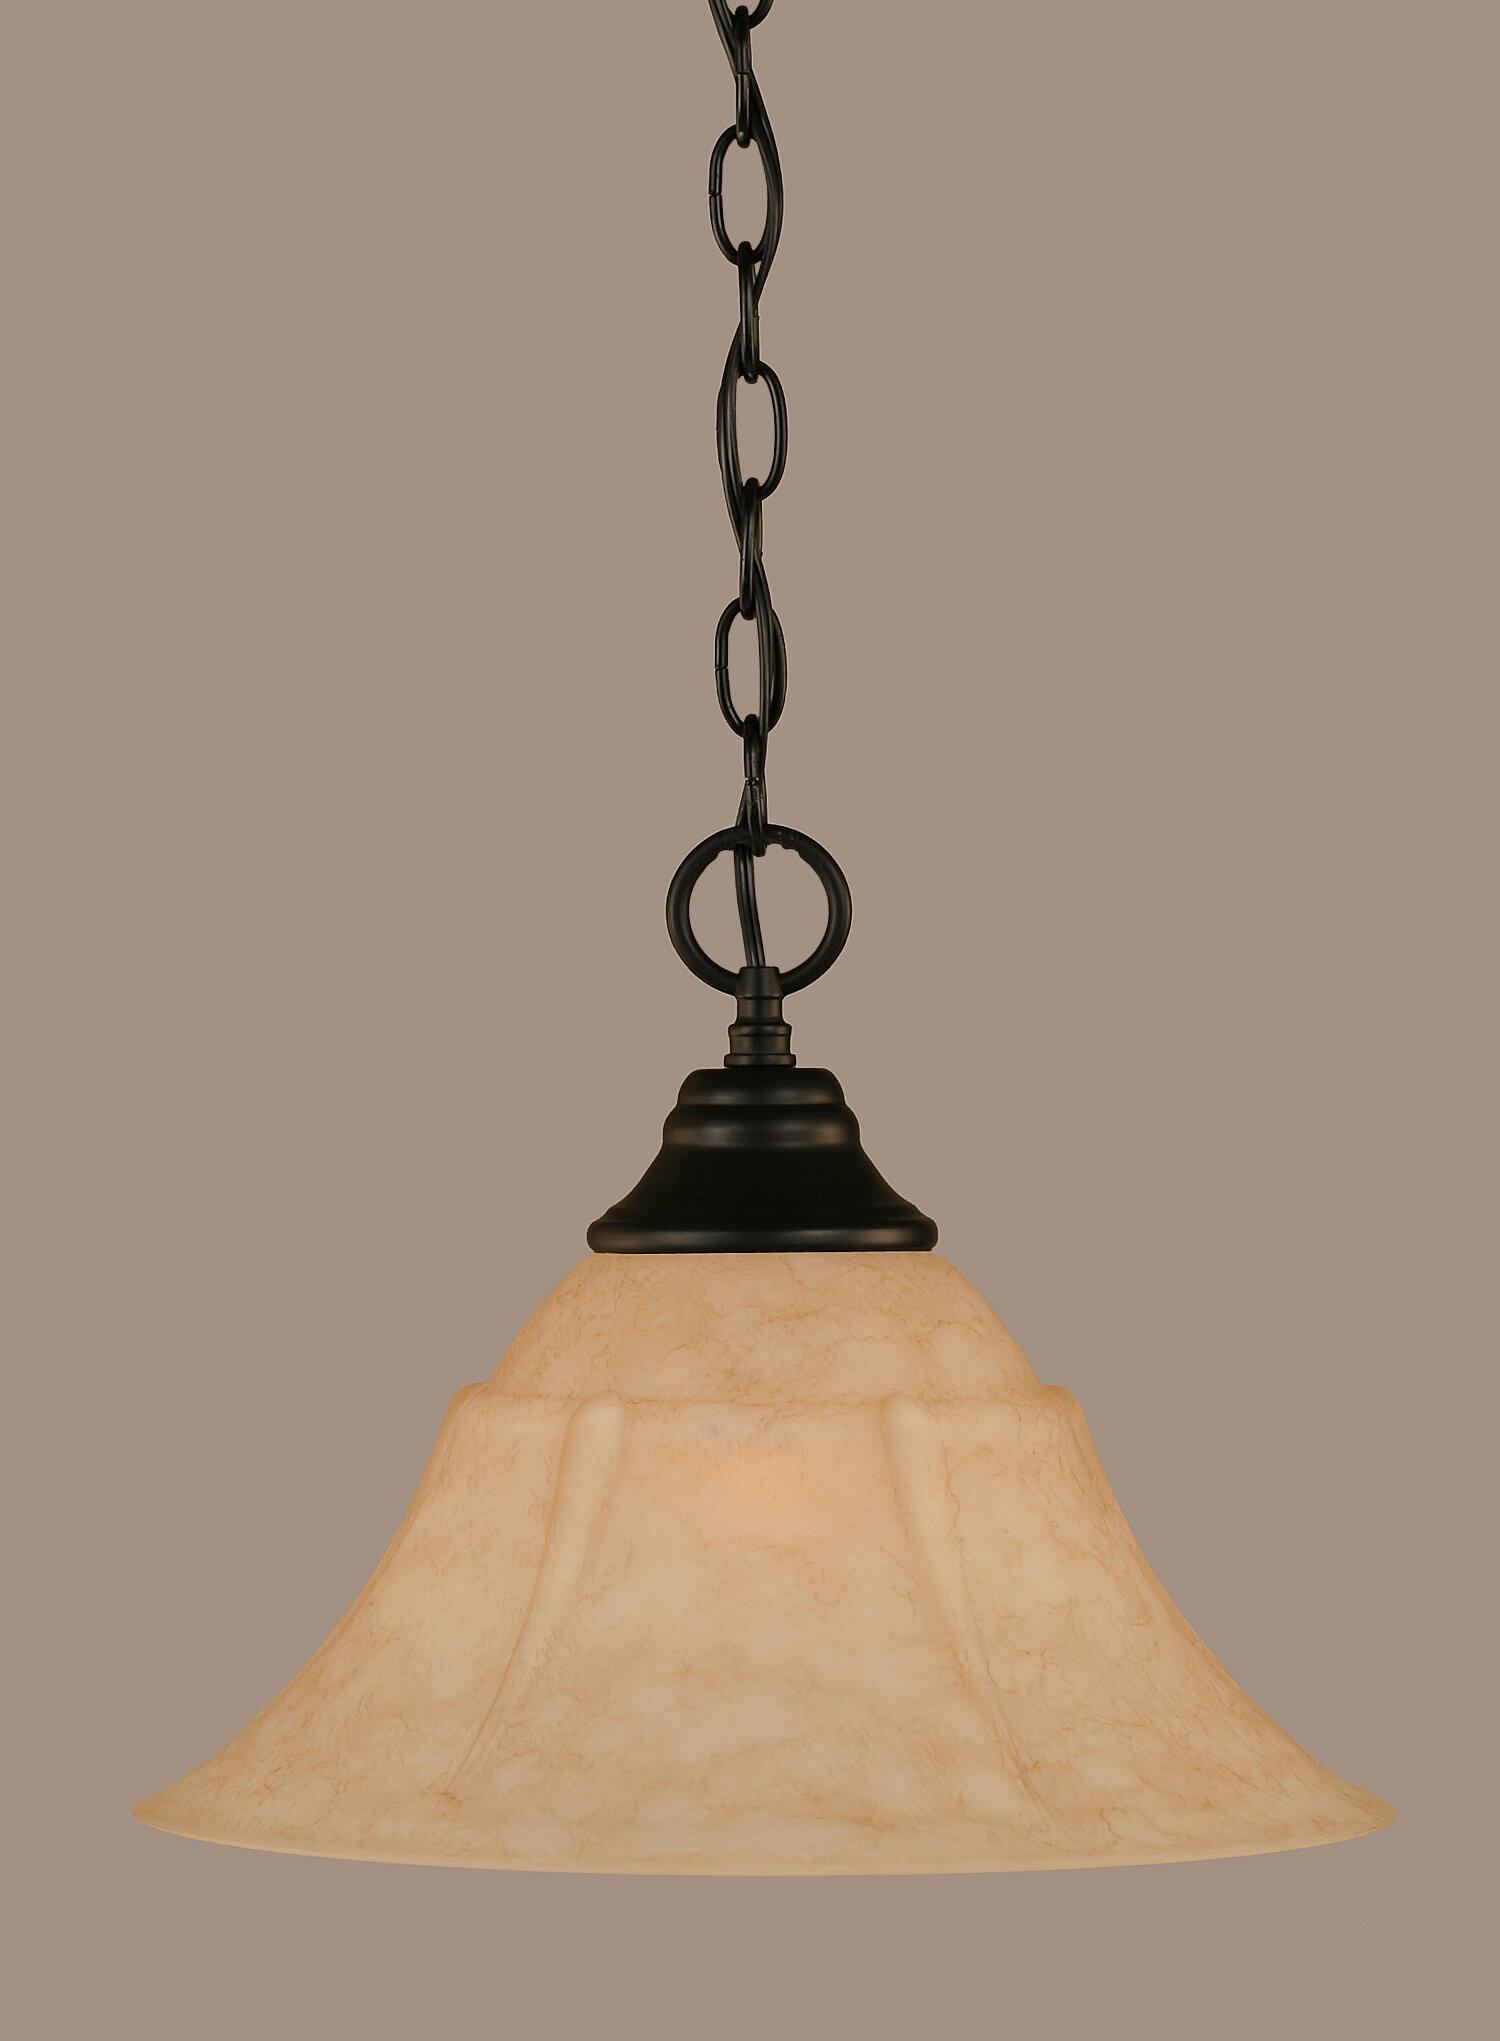 Red Barrel Studio Sinclair 1 Light Single Bell Pendant Wayfair